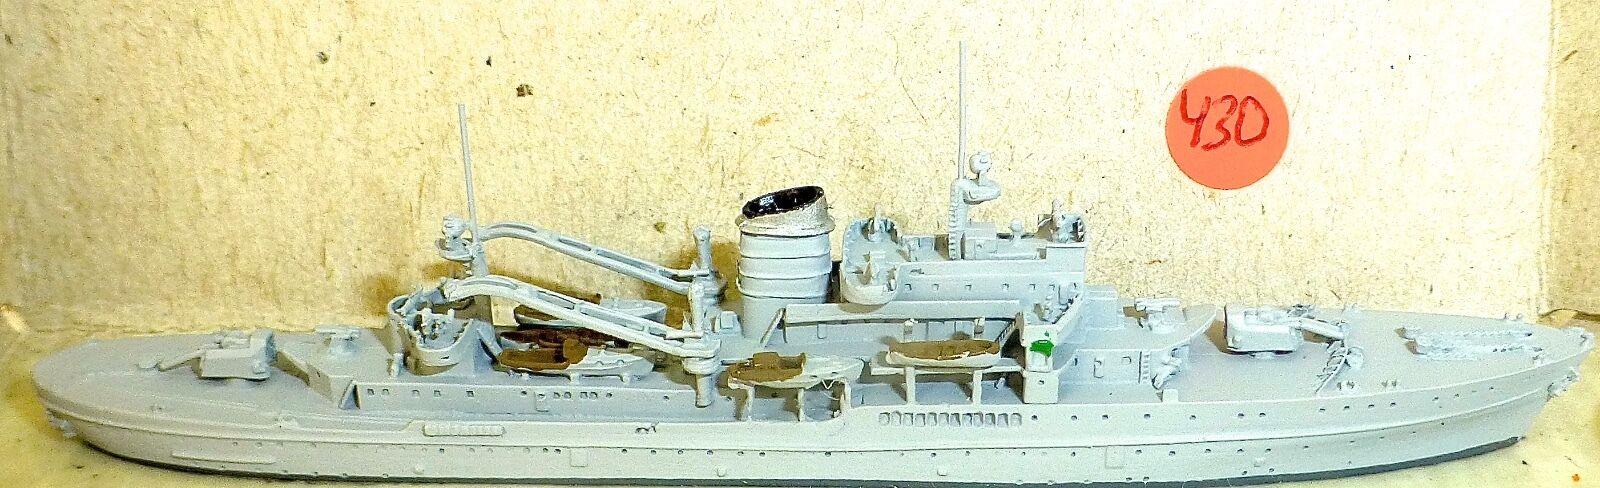 V wissmann Maqueta de barco Neptun 1093 1 1250 shp430 shp430 shp430 Å   076e48